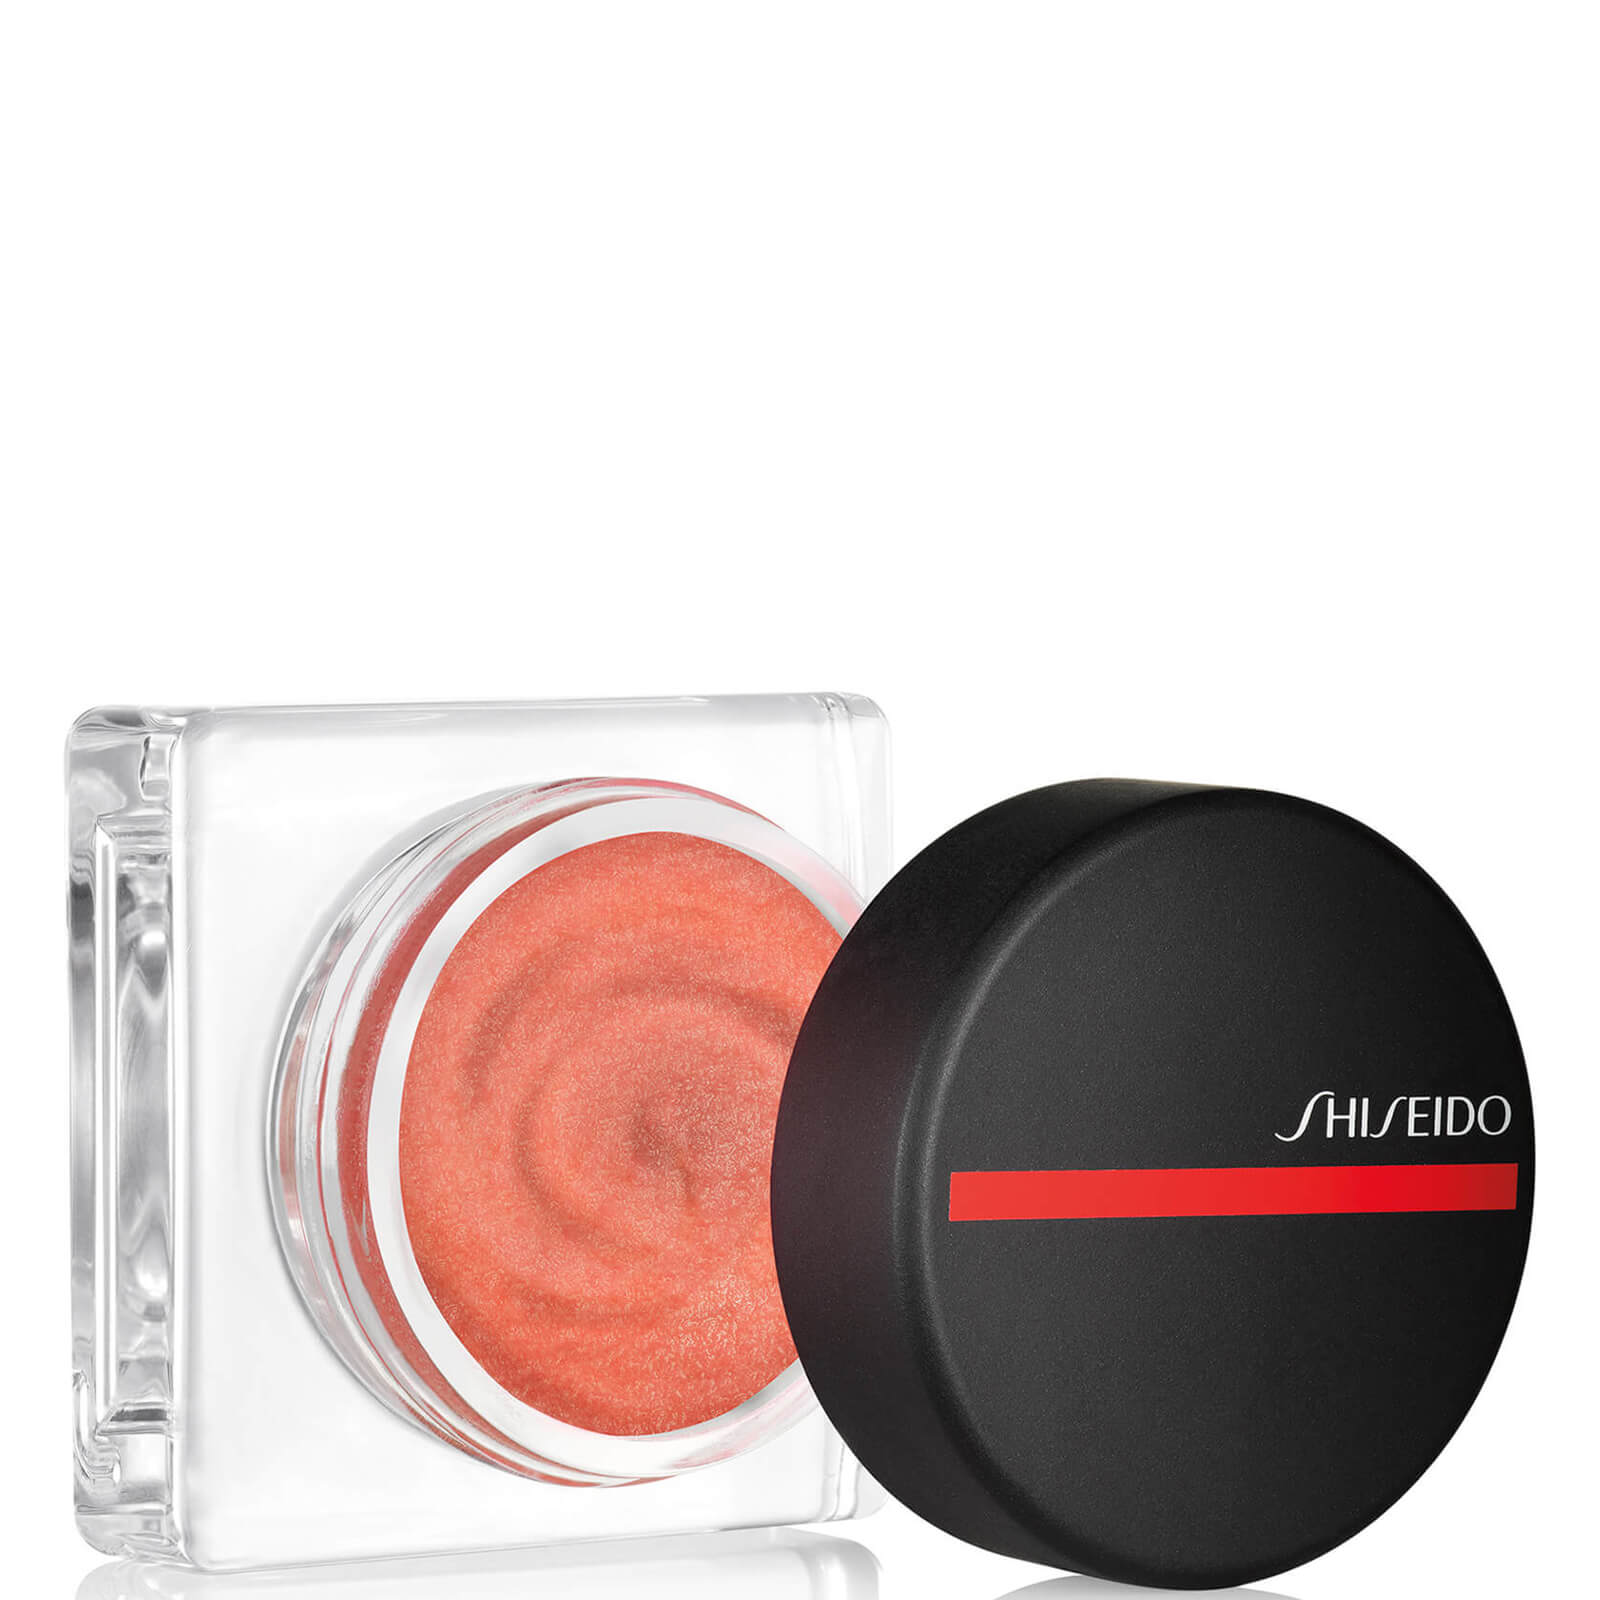 Купить Румяна-вуаль Shiseido Minimalist Whipped Powder Blush (различные оттенки) - Blush Momoko 03